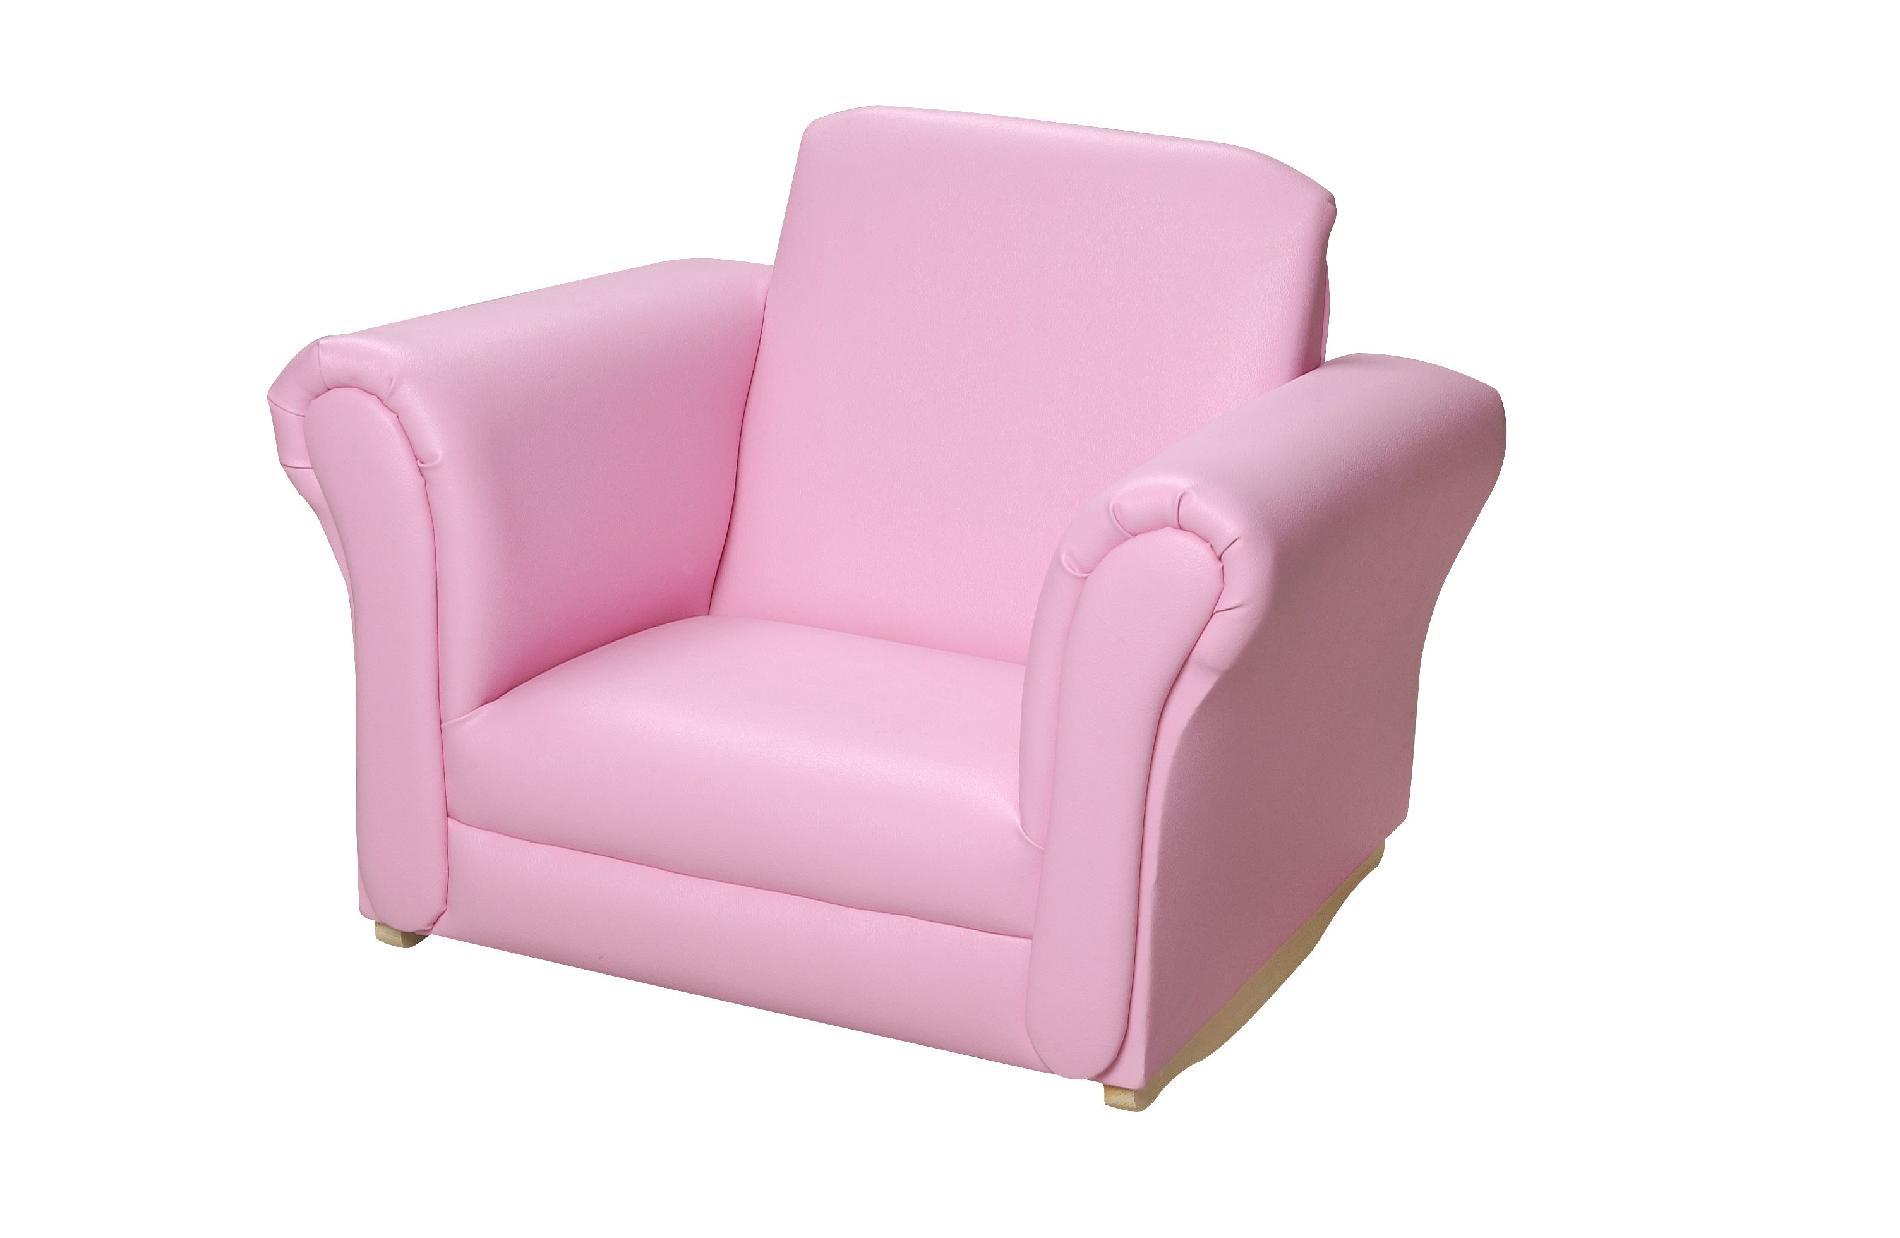 white upholstered rocking chair christmas back covers uk kmart